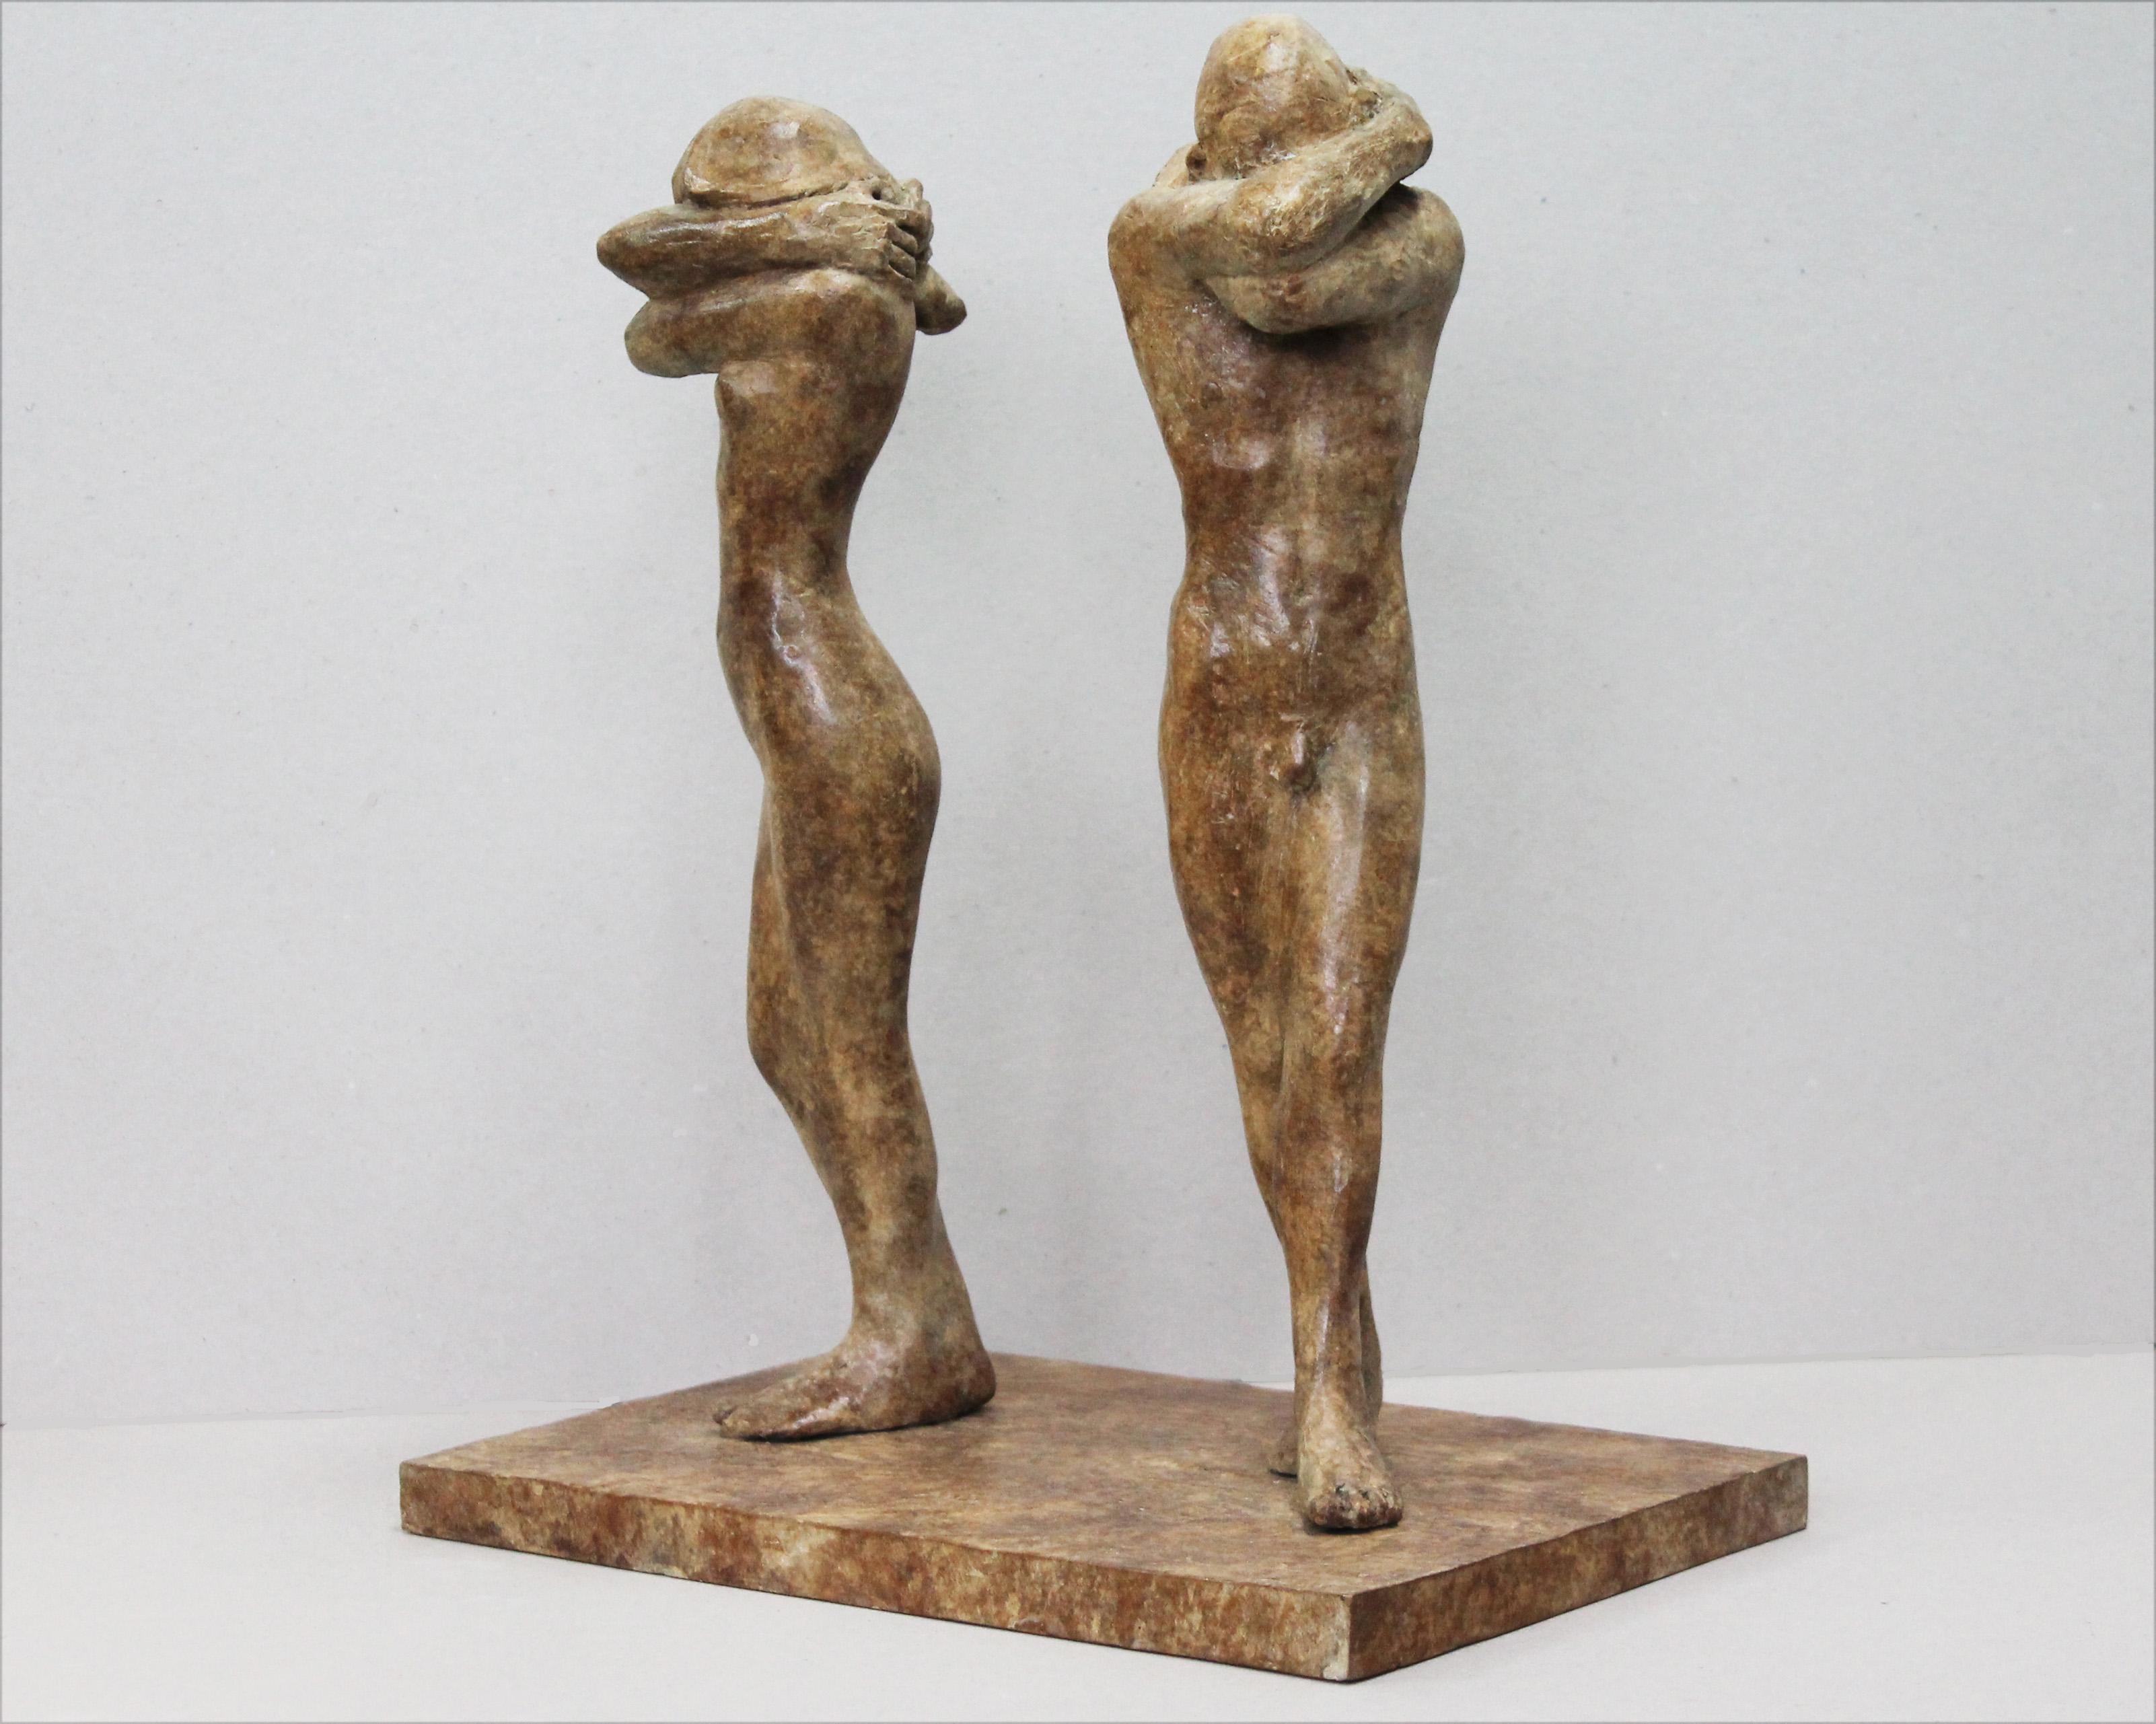 'Adam & Eve together in Shame', Bronze, edt of 6, 37cm x 24cm x 12cm, E2600